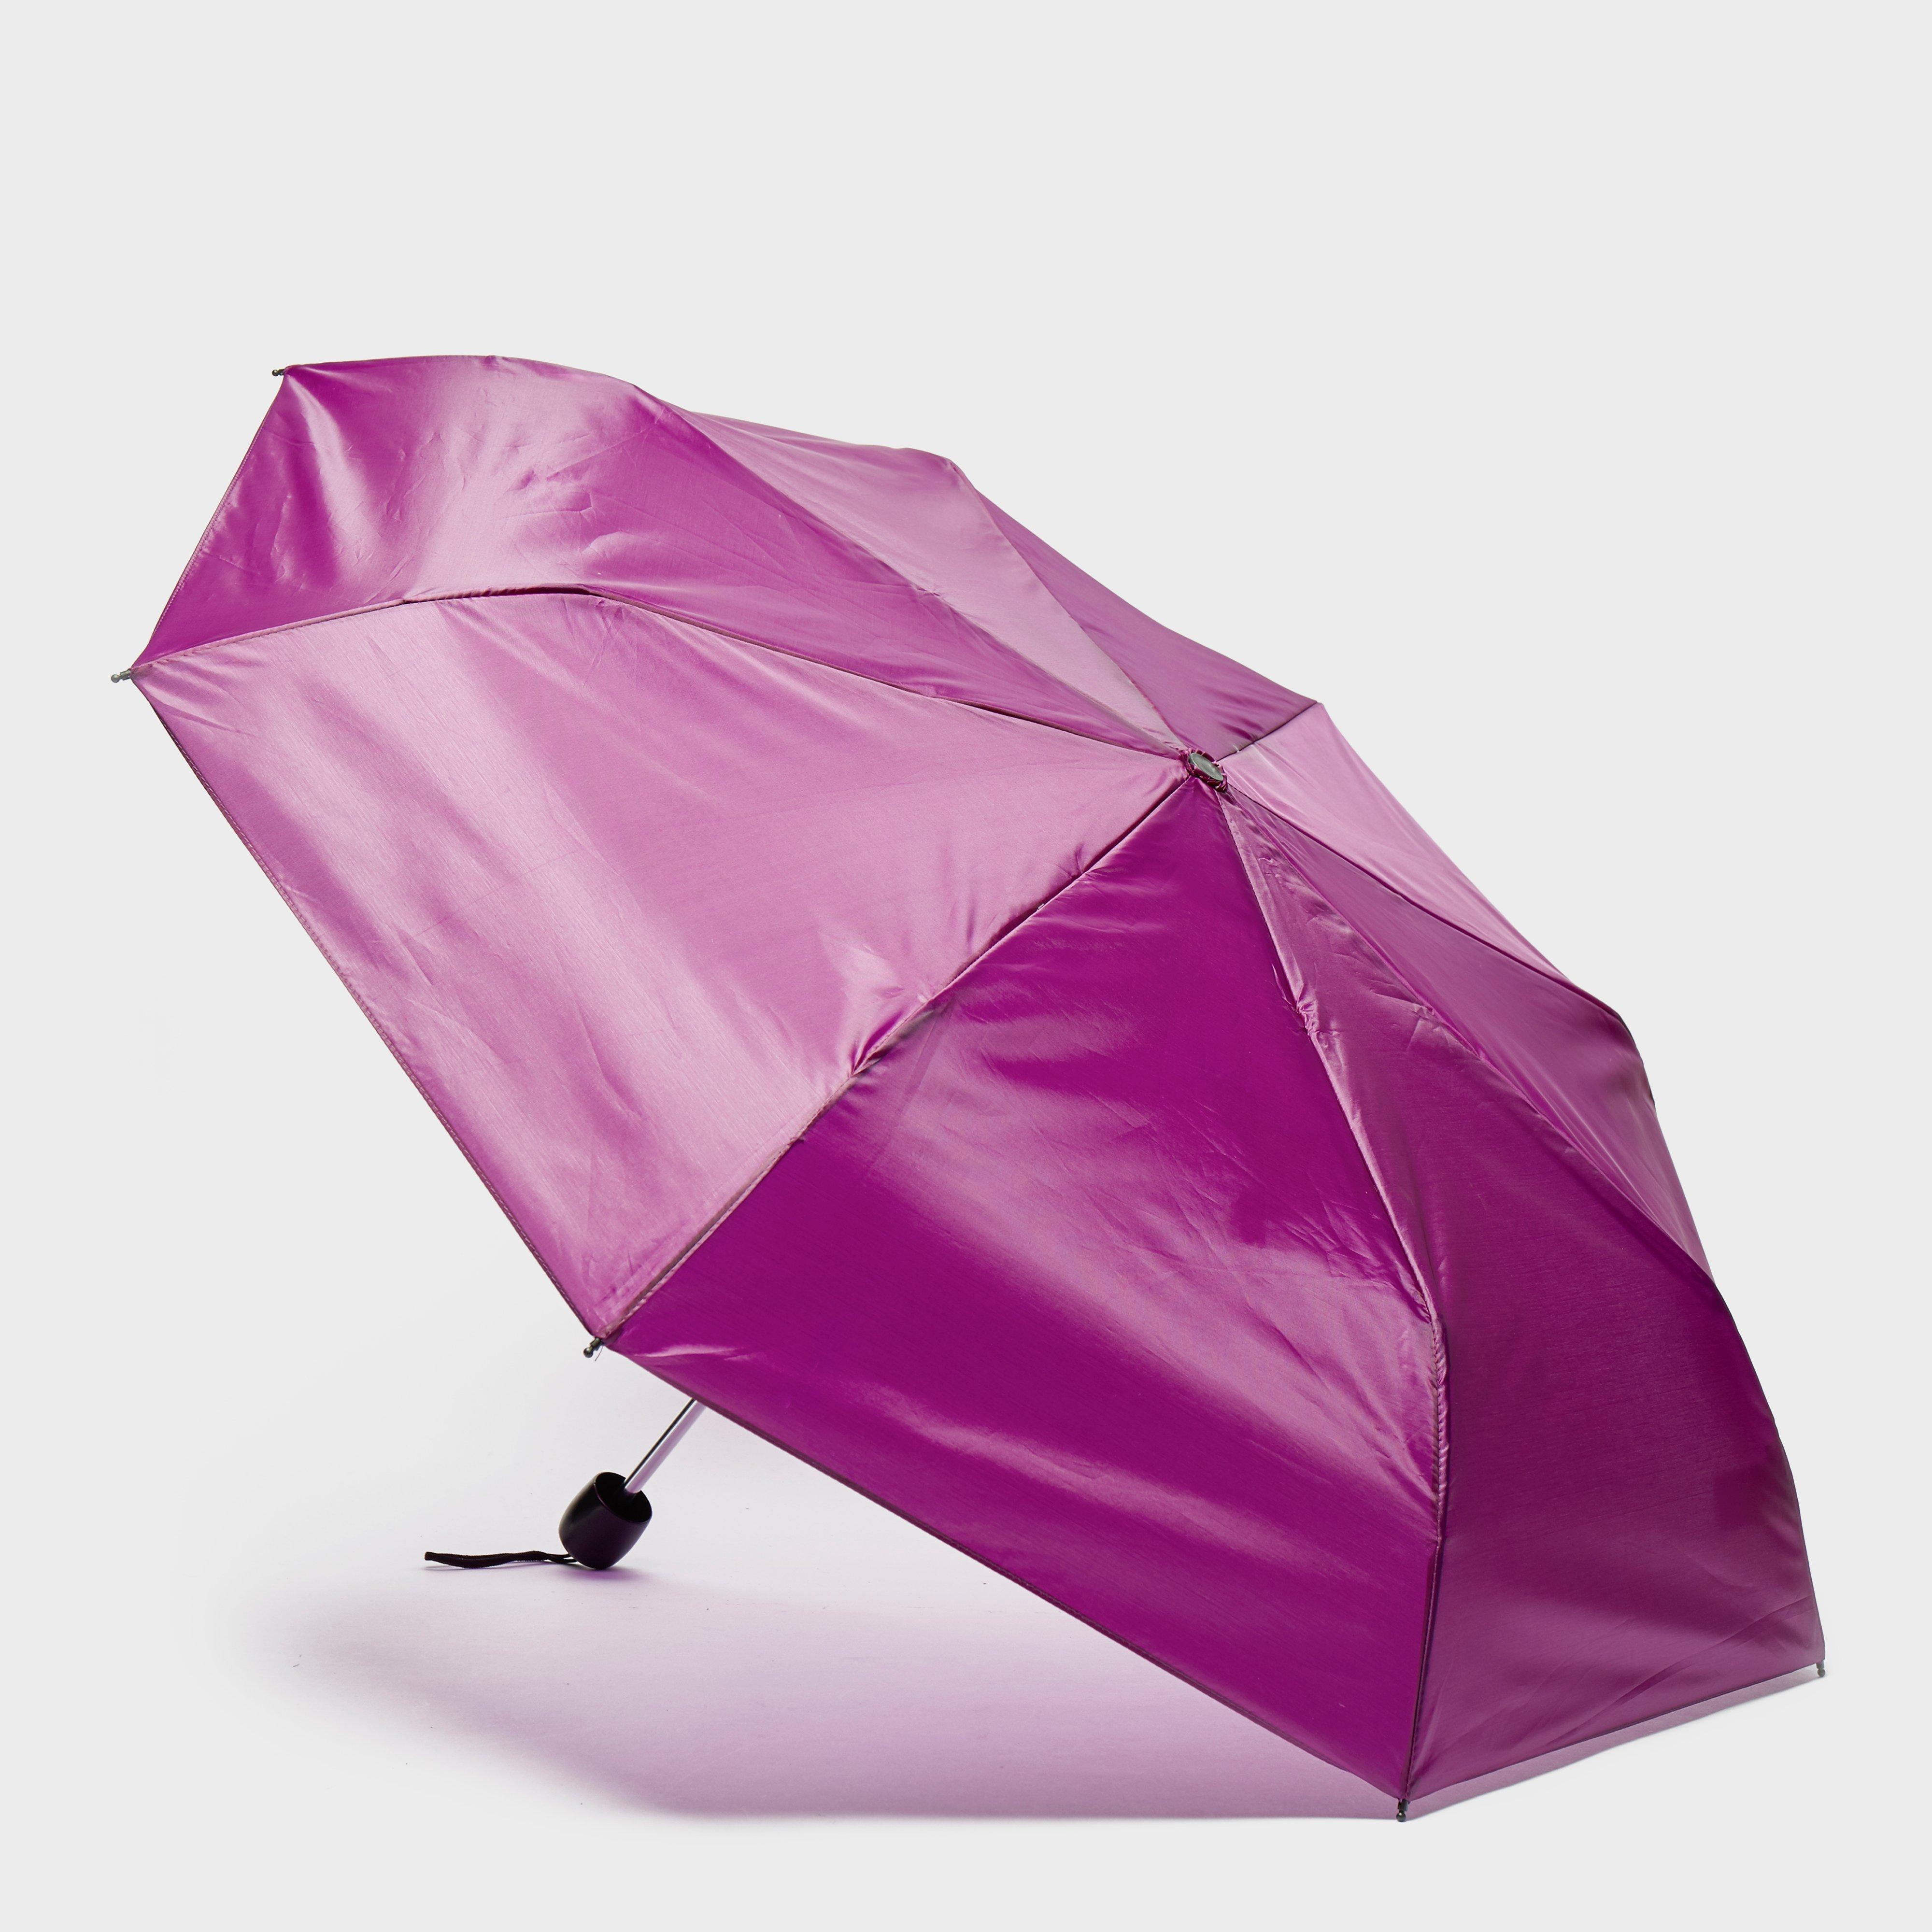 Image of Peter Storm Mini Compact Umbrella - Pink/Pup, pink/PUP